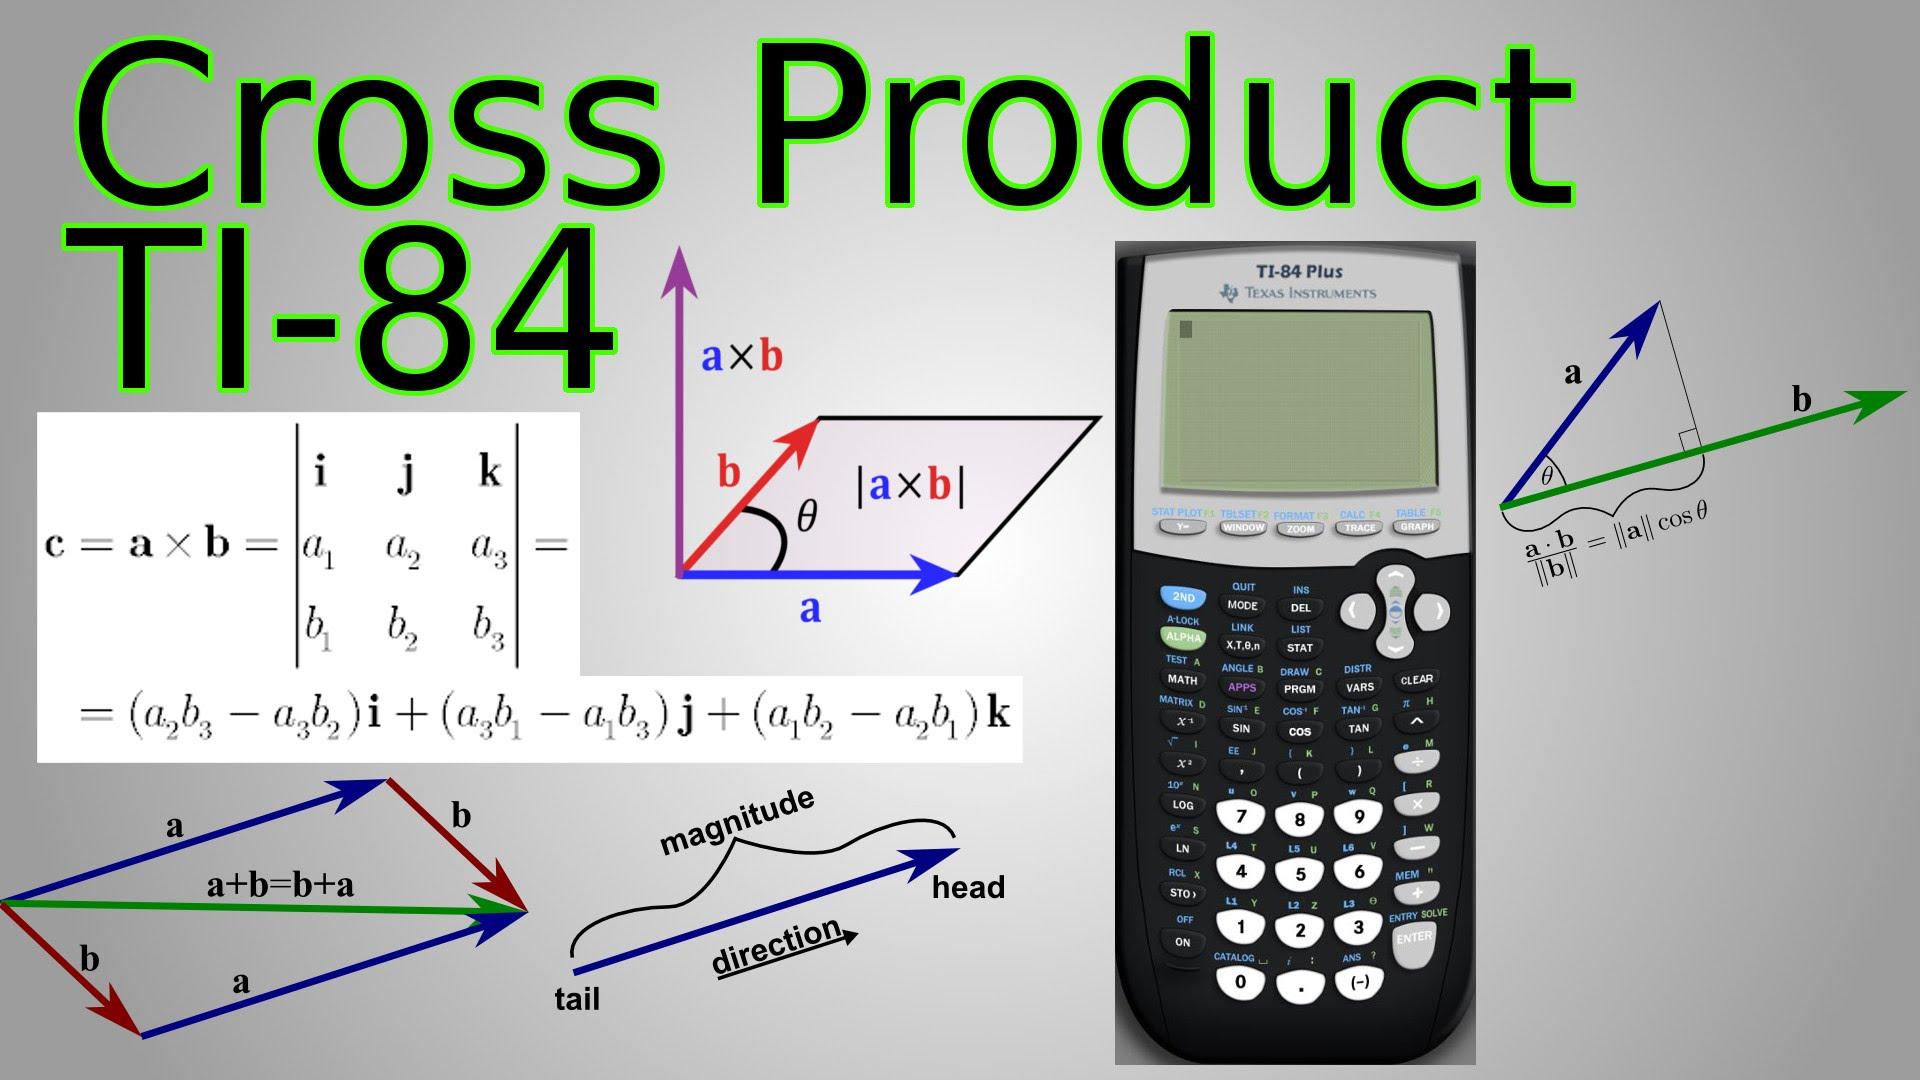 1920x1080 Ti 84 Cross Product Program Amp Dot Product For Vectors (Triple